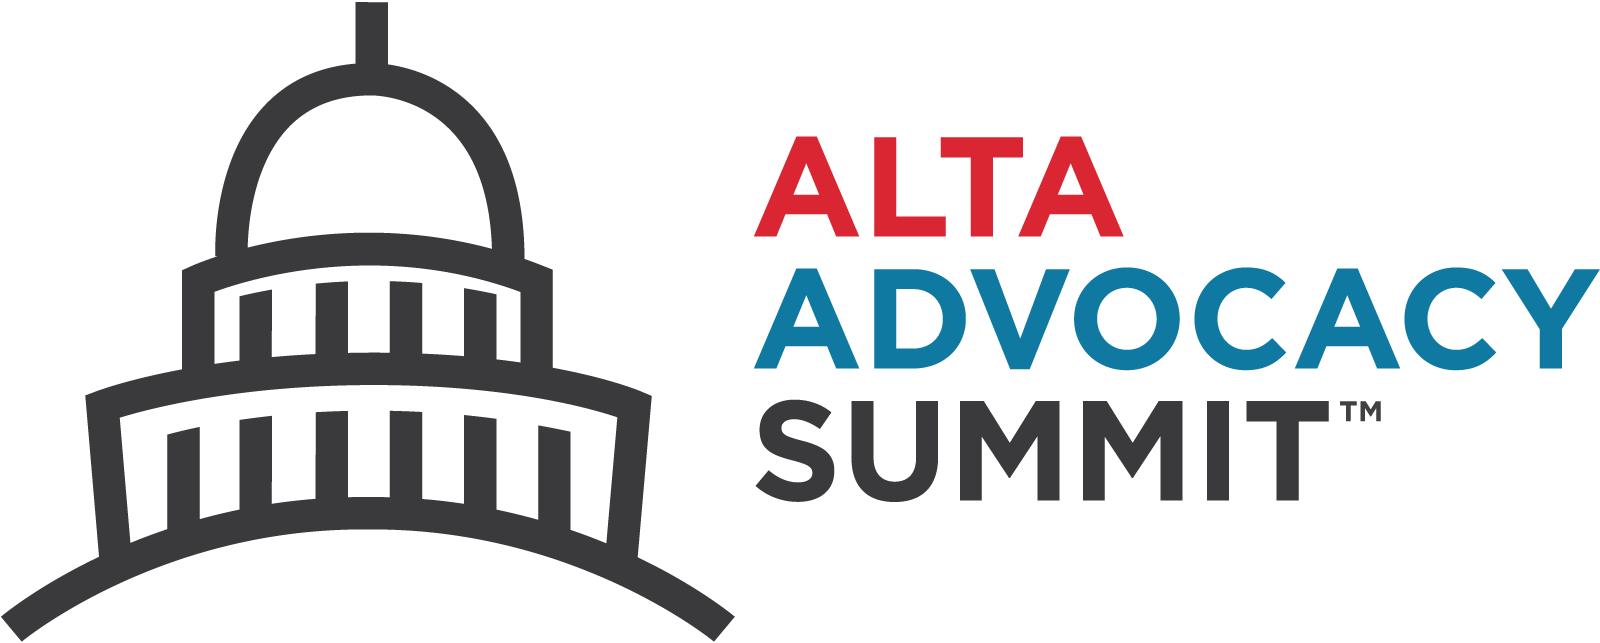 ALTA 2018 Advocacy Summit